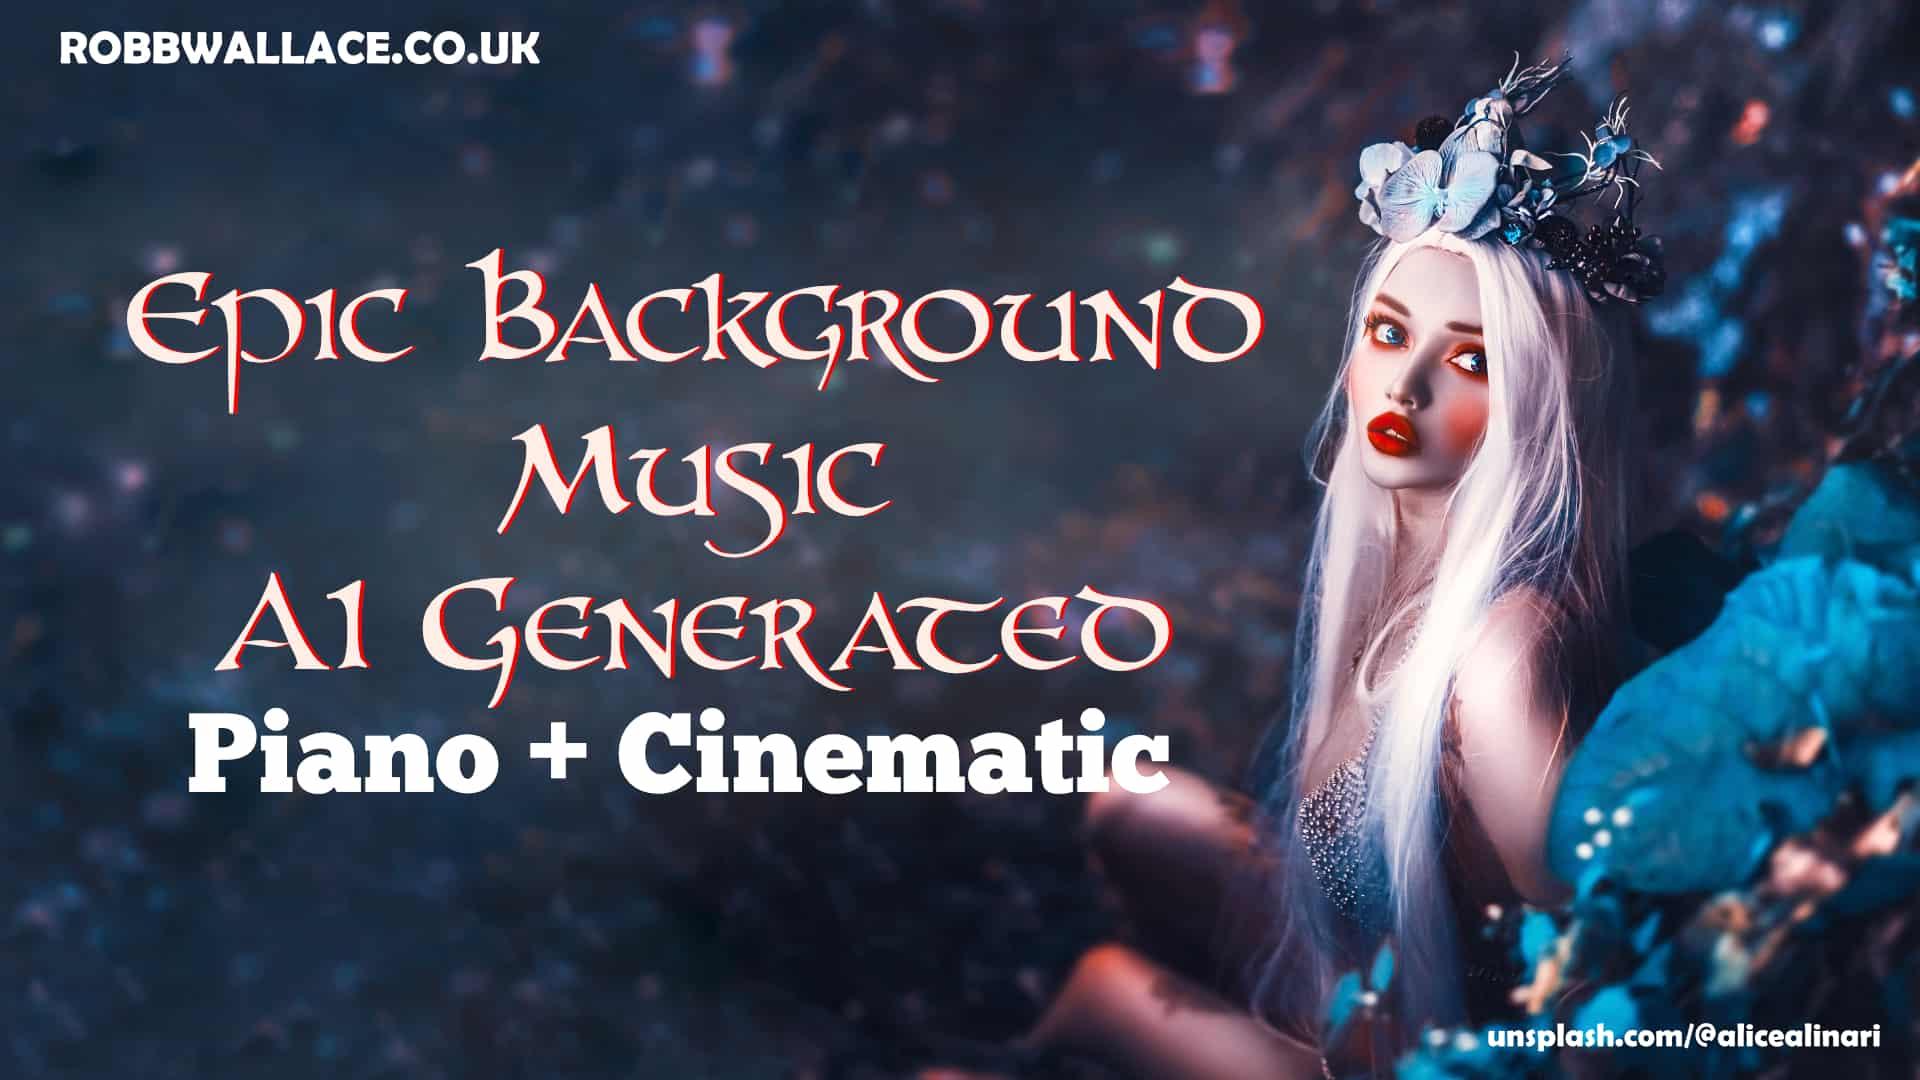 Epic-backround-music-sept